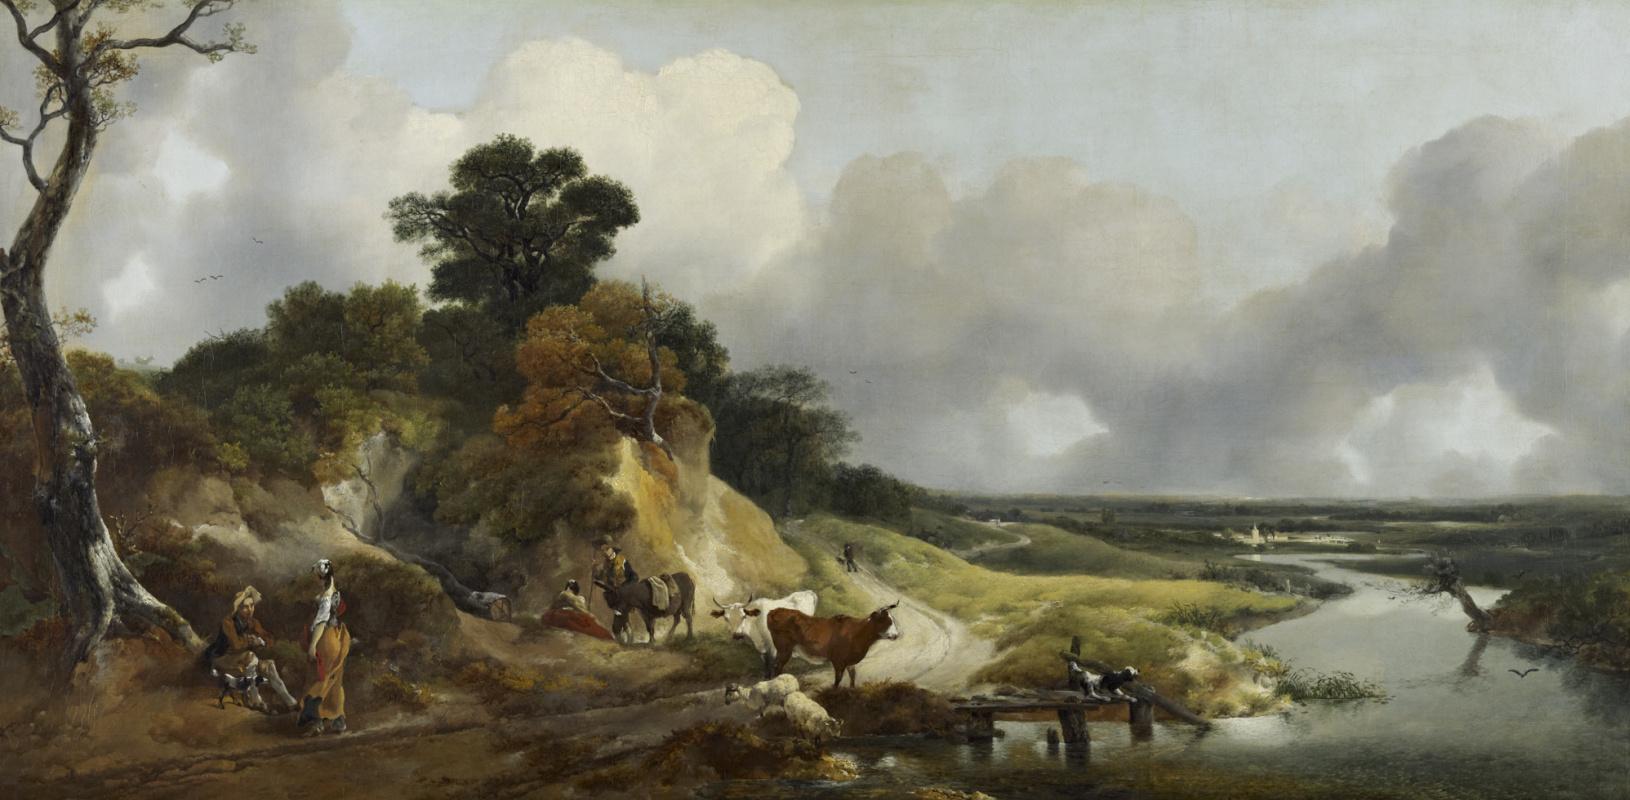 Thomas Gainsborough. Landscape near the village of Cornard